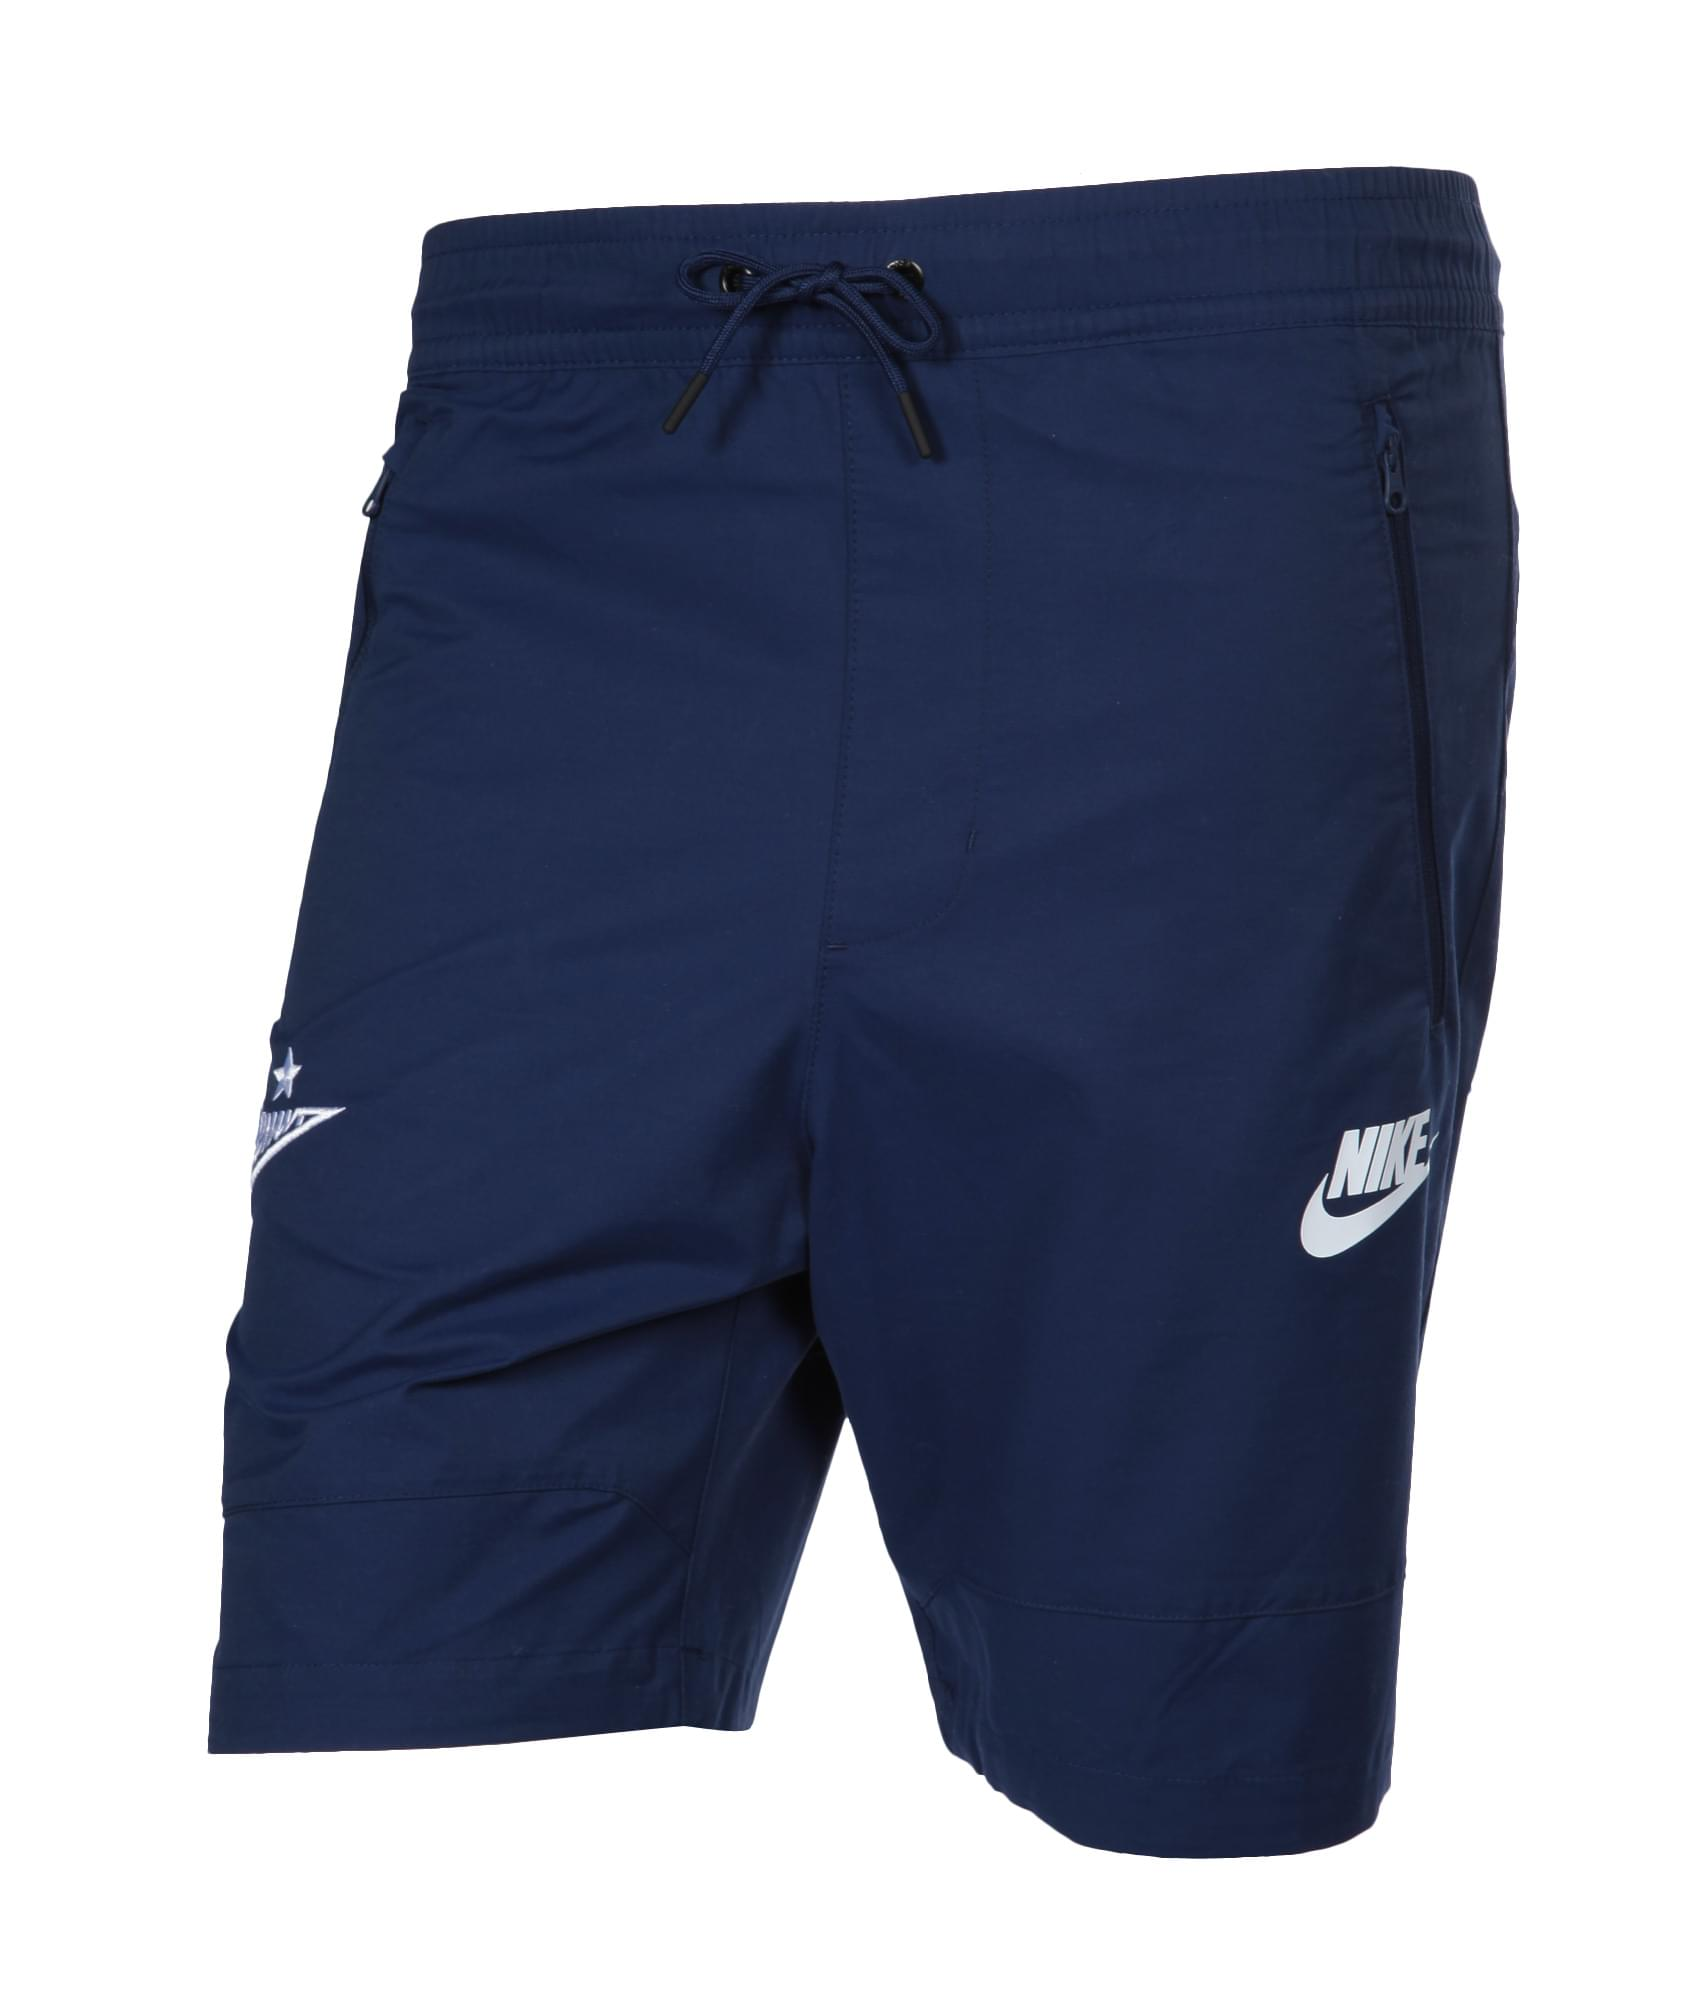 Шорты Nike, Цвет-Синий, Размер-XS найк борзов найк борзов избранное ii